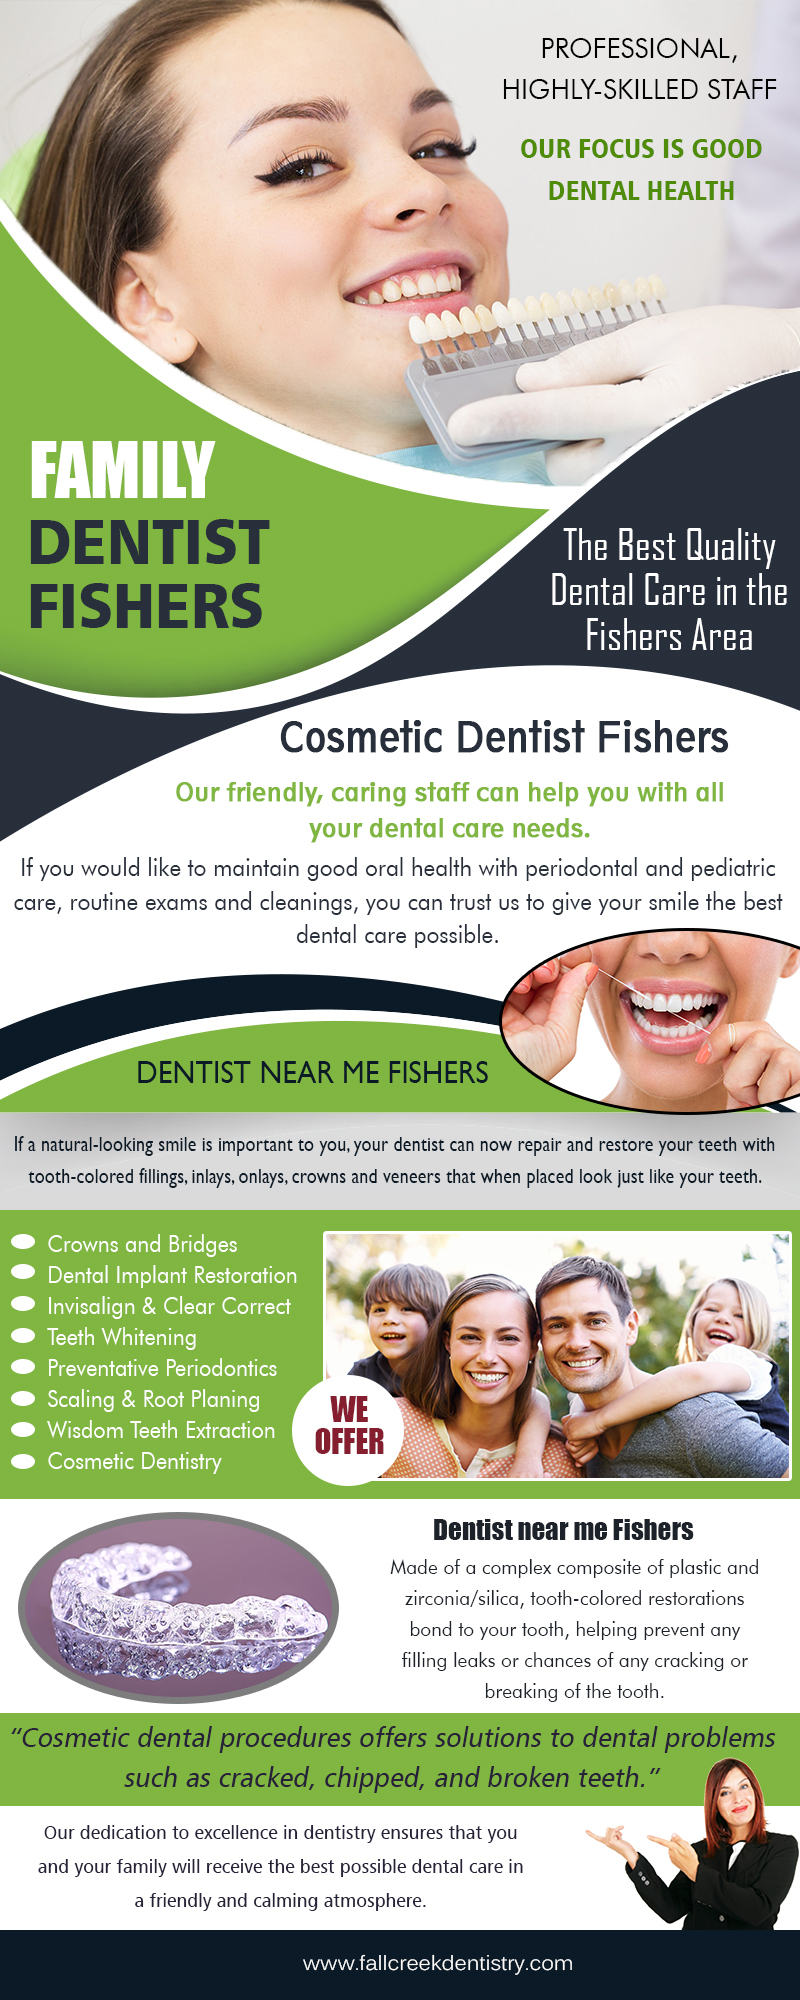 Family Teeth Dentist Fishers | 3175968000 | fallcreekdentistry.com